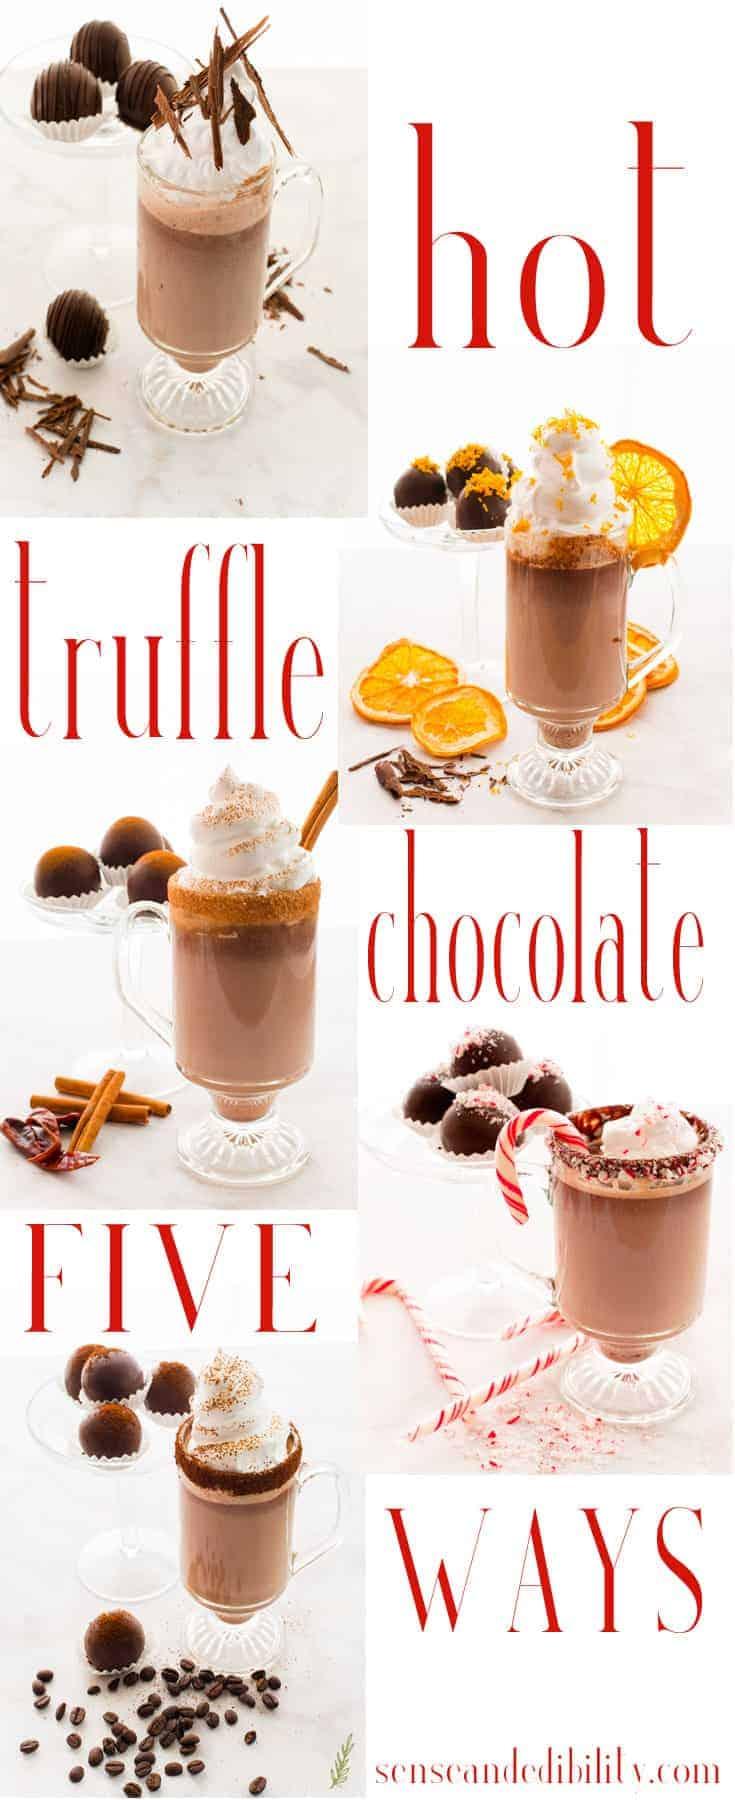 Sense & Edibility's Hot Truffle Chocolate Pin